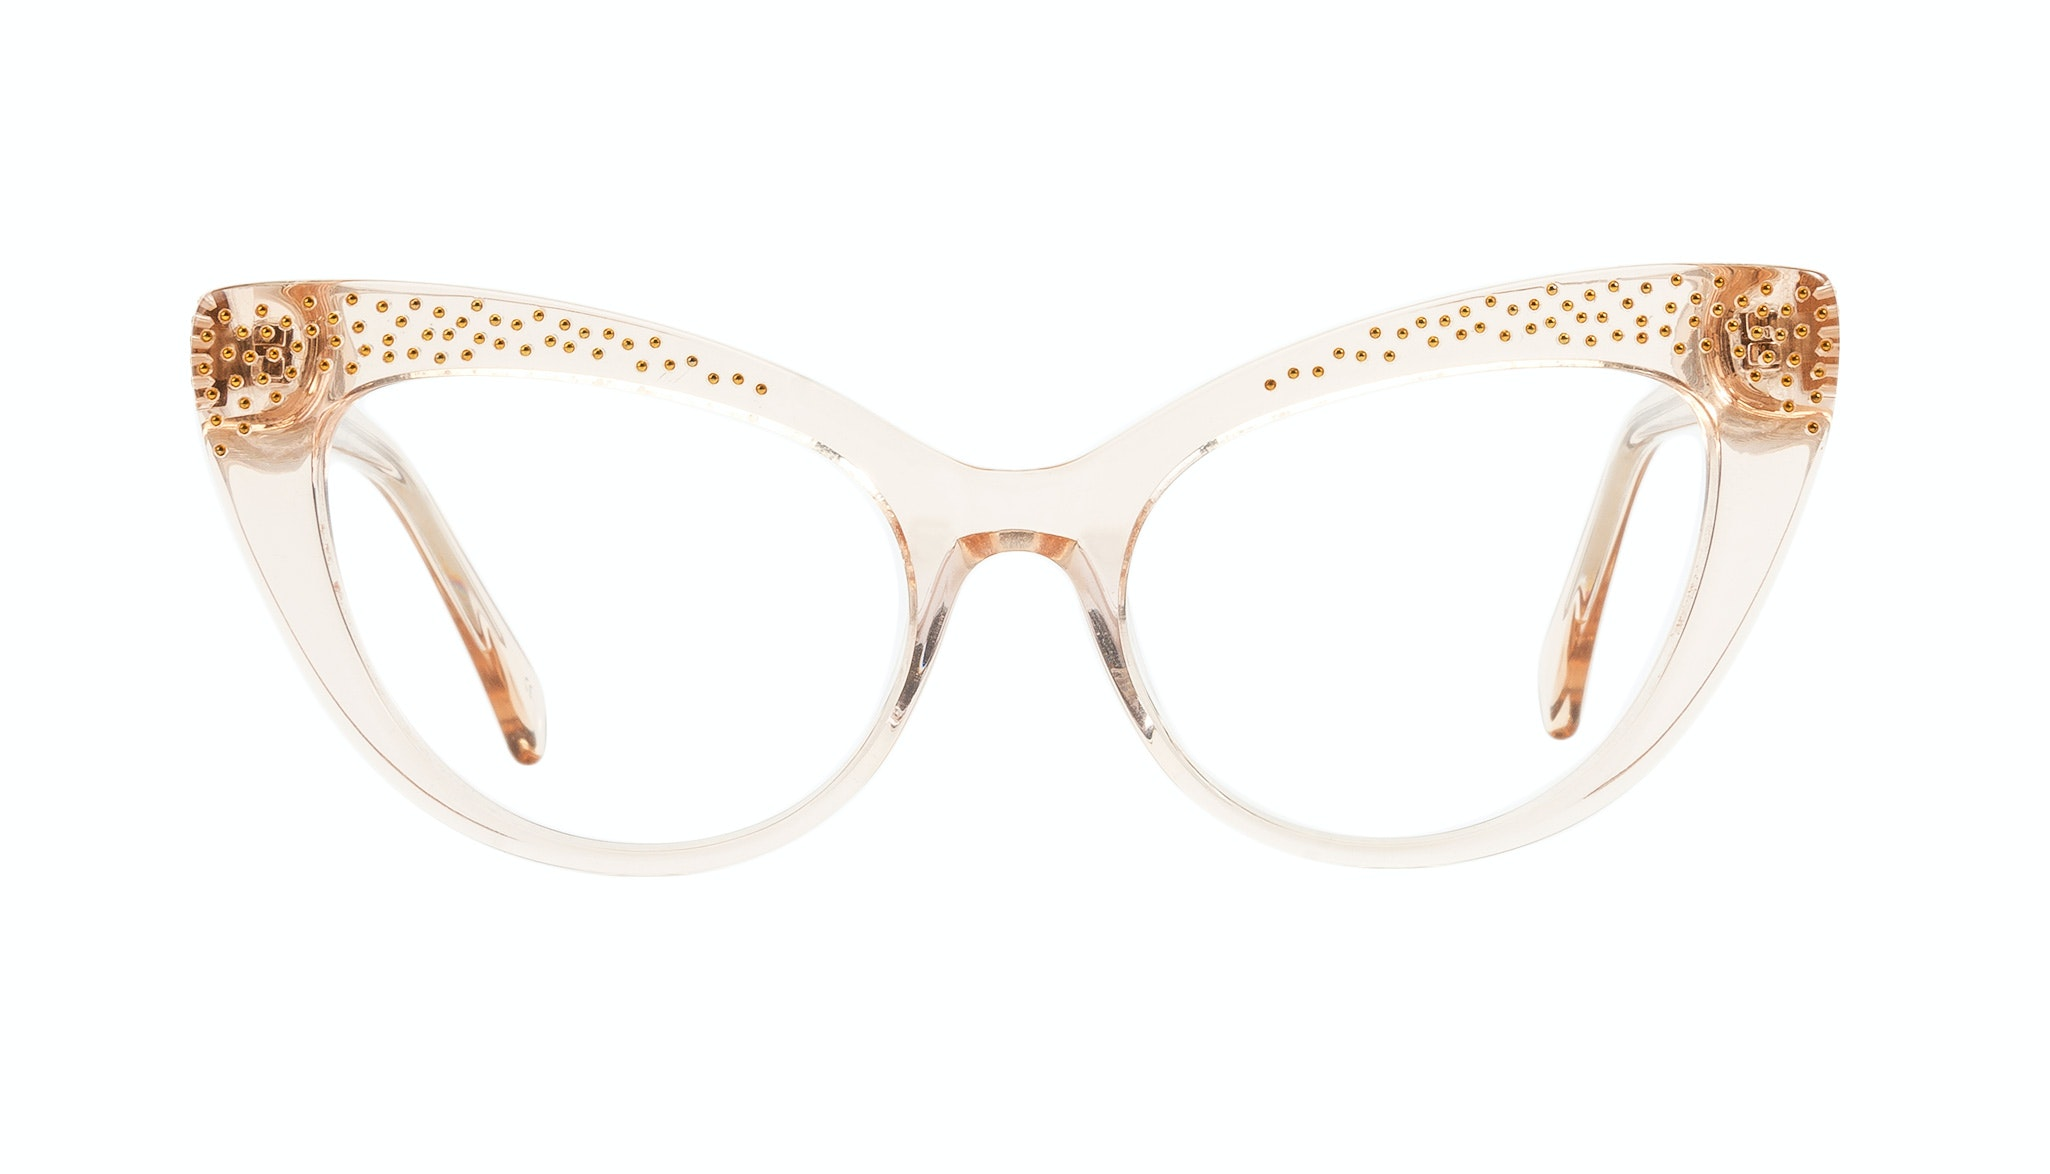 Affordable Fashion Glasses Cat Eye Daring Cateye Eyeglasses Women Keiko Shug Blond Front